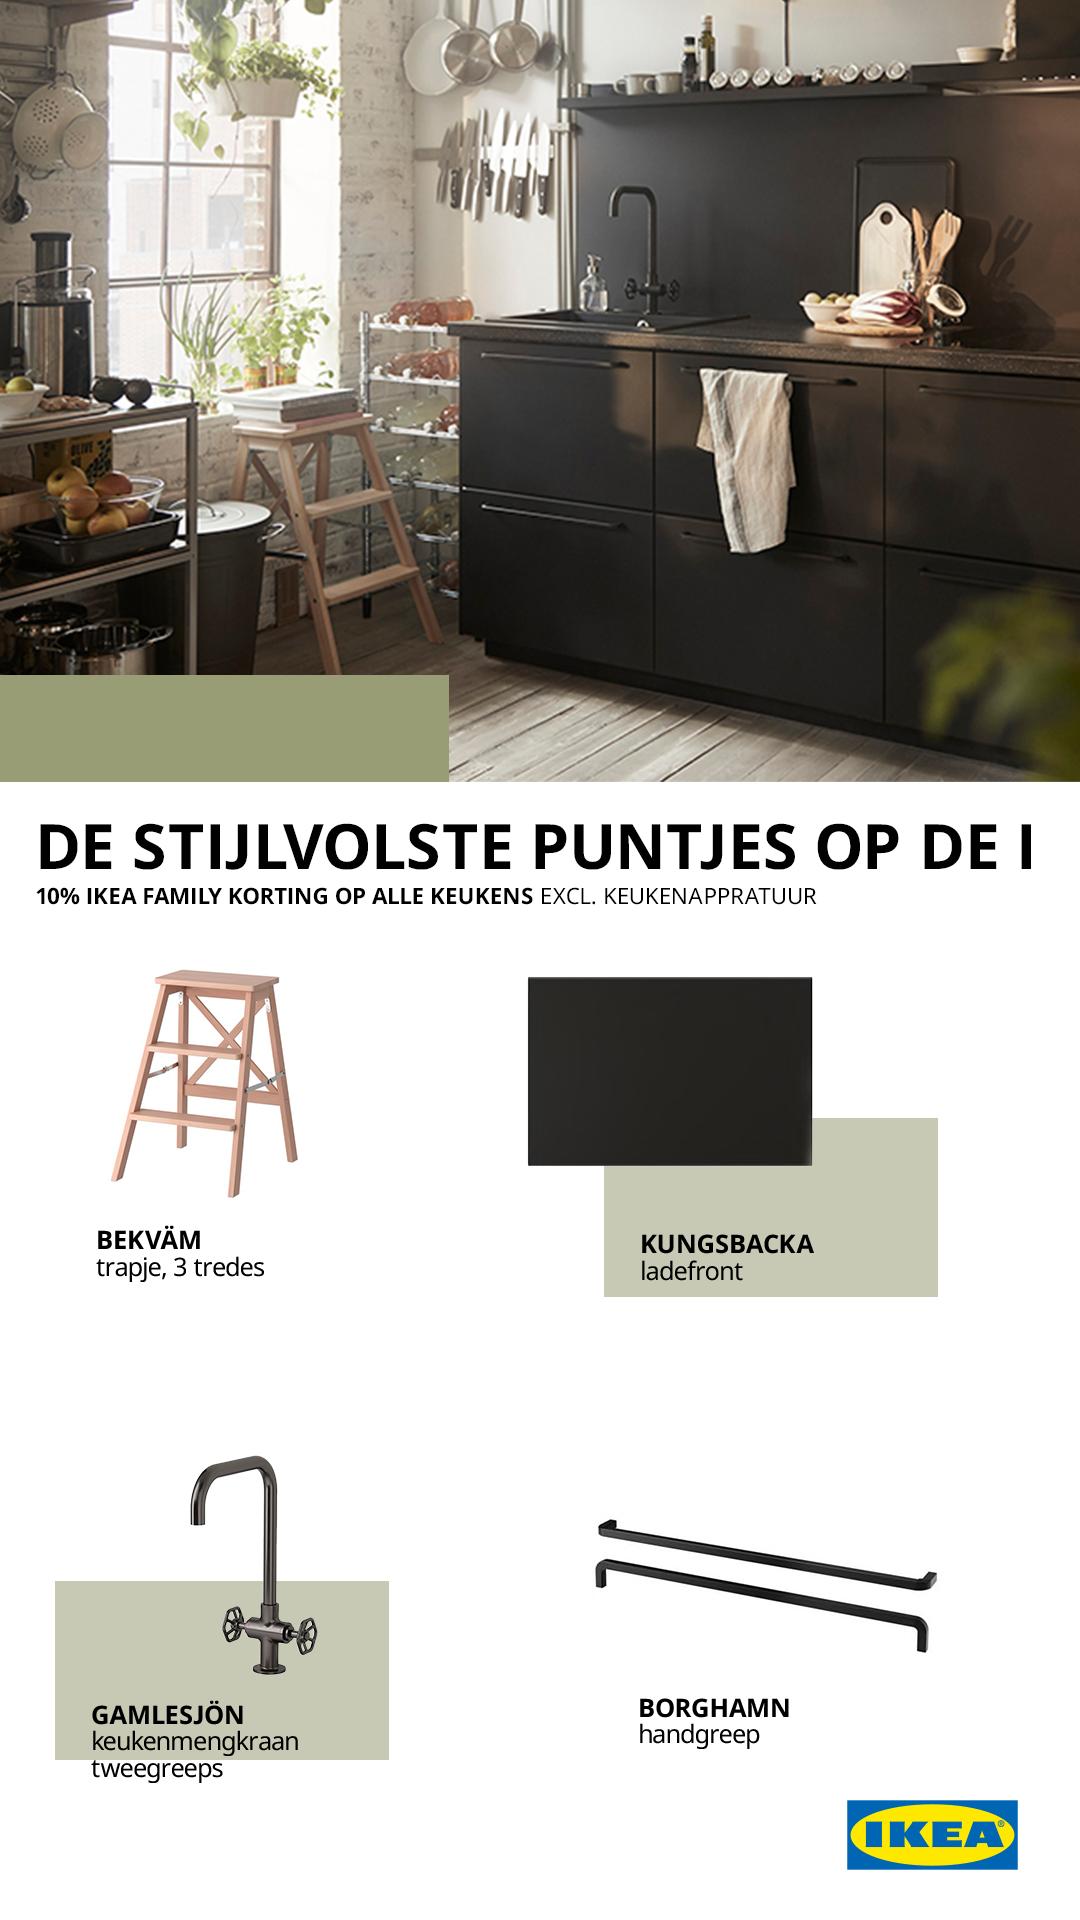 T M 17 Juni 10 Ikea Family Korting Op Alle Keukens Excl Keukenapparatuur Keuken Handgrepen Onder Kast Keuken